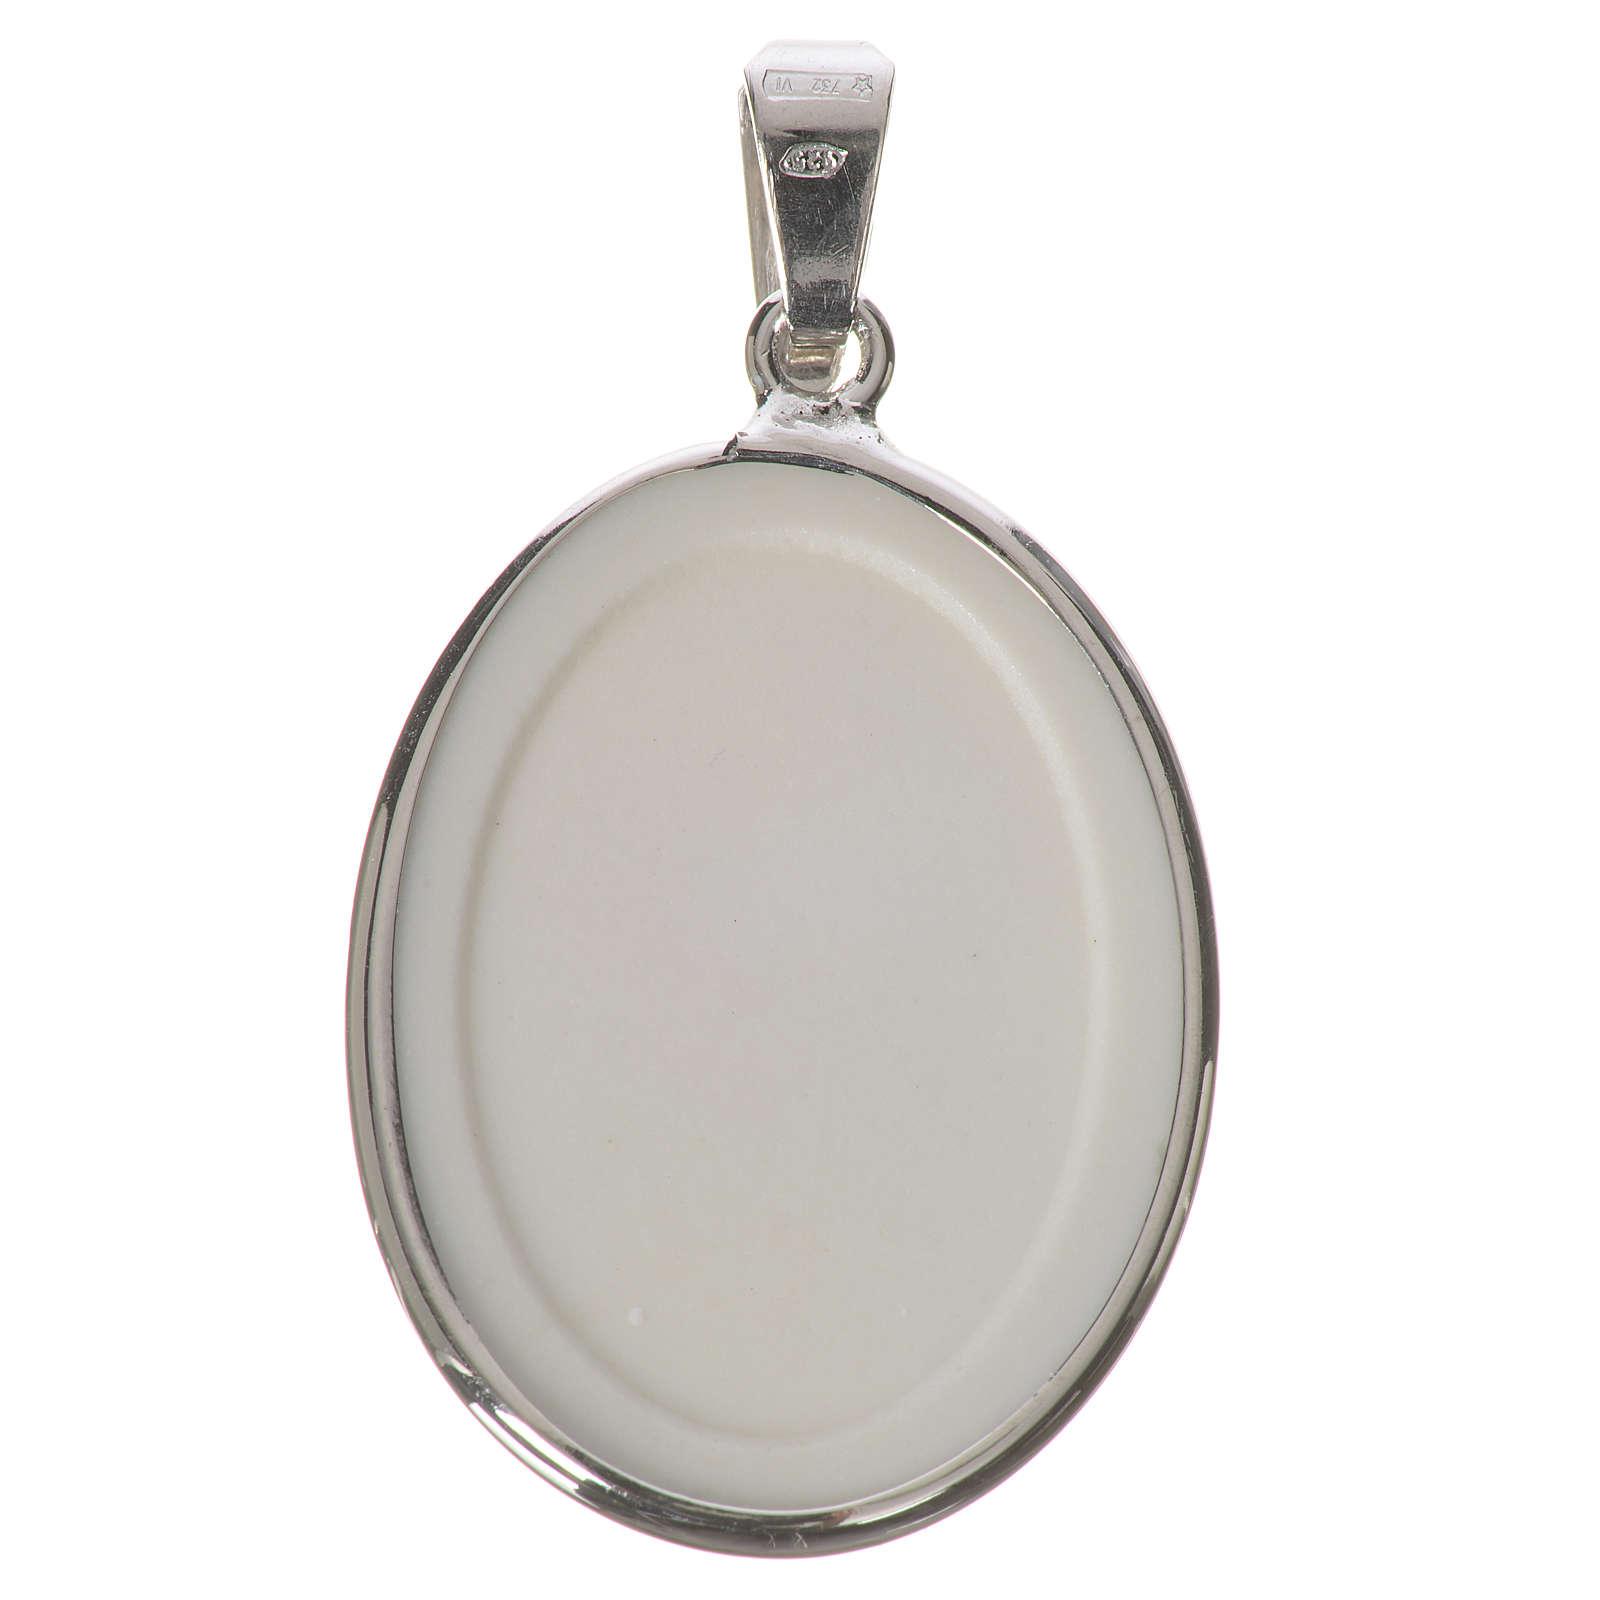 Médaille ovale argent 27mm Jean-Paul II 4